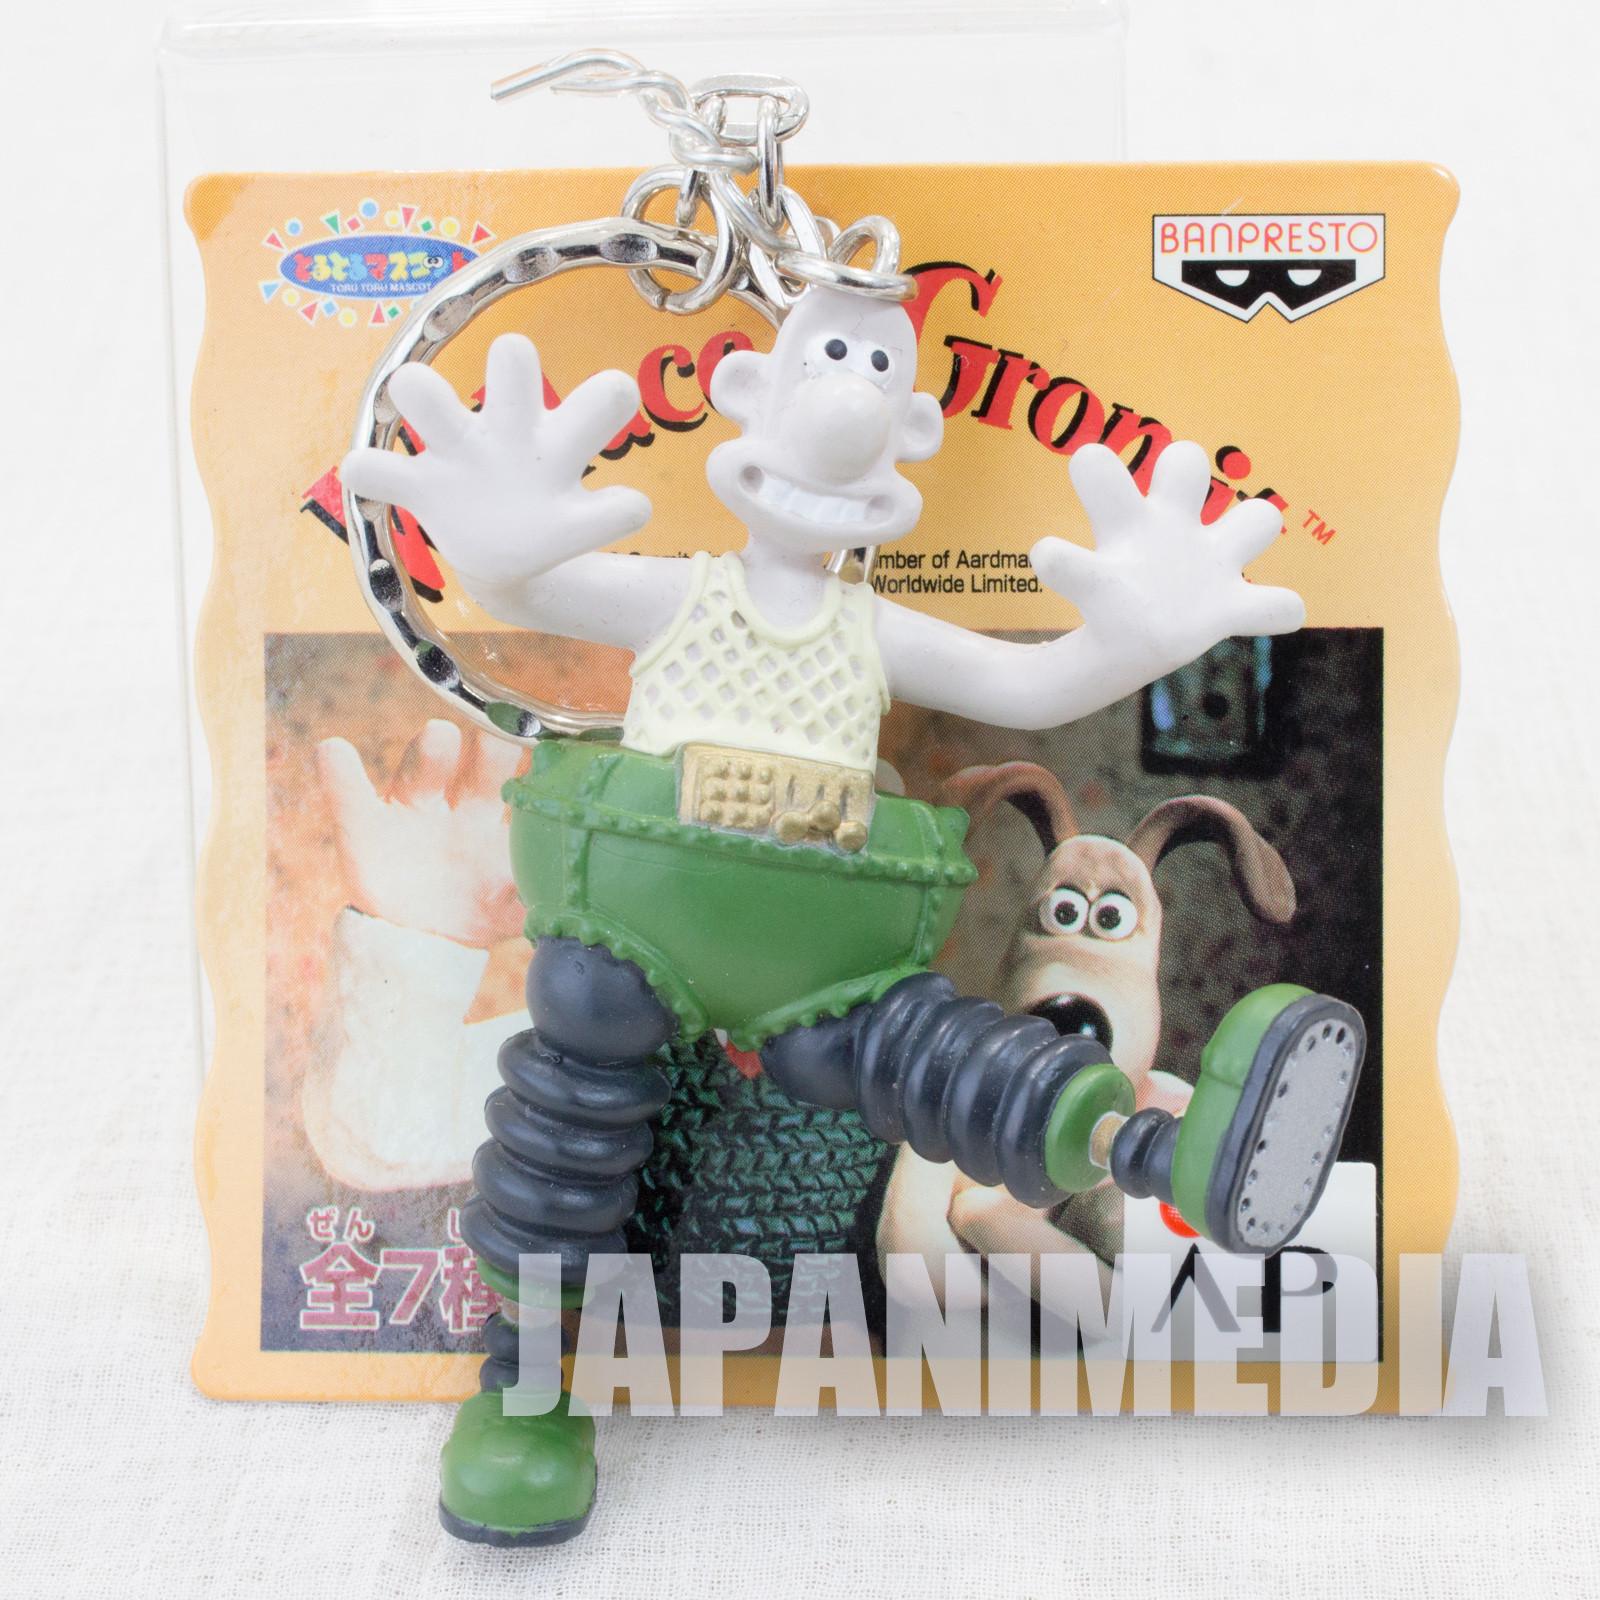 Wallace & Gromit WALLACE Figure Key Chain Banpresto JAPAN Ardman ANIME